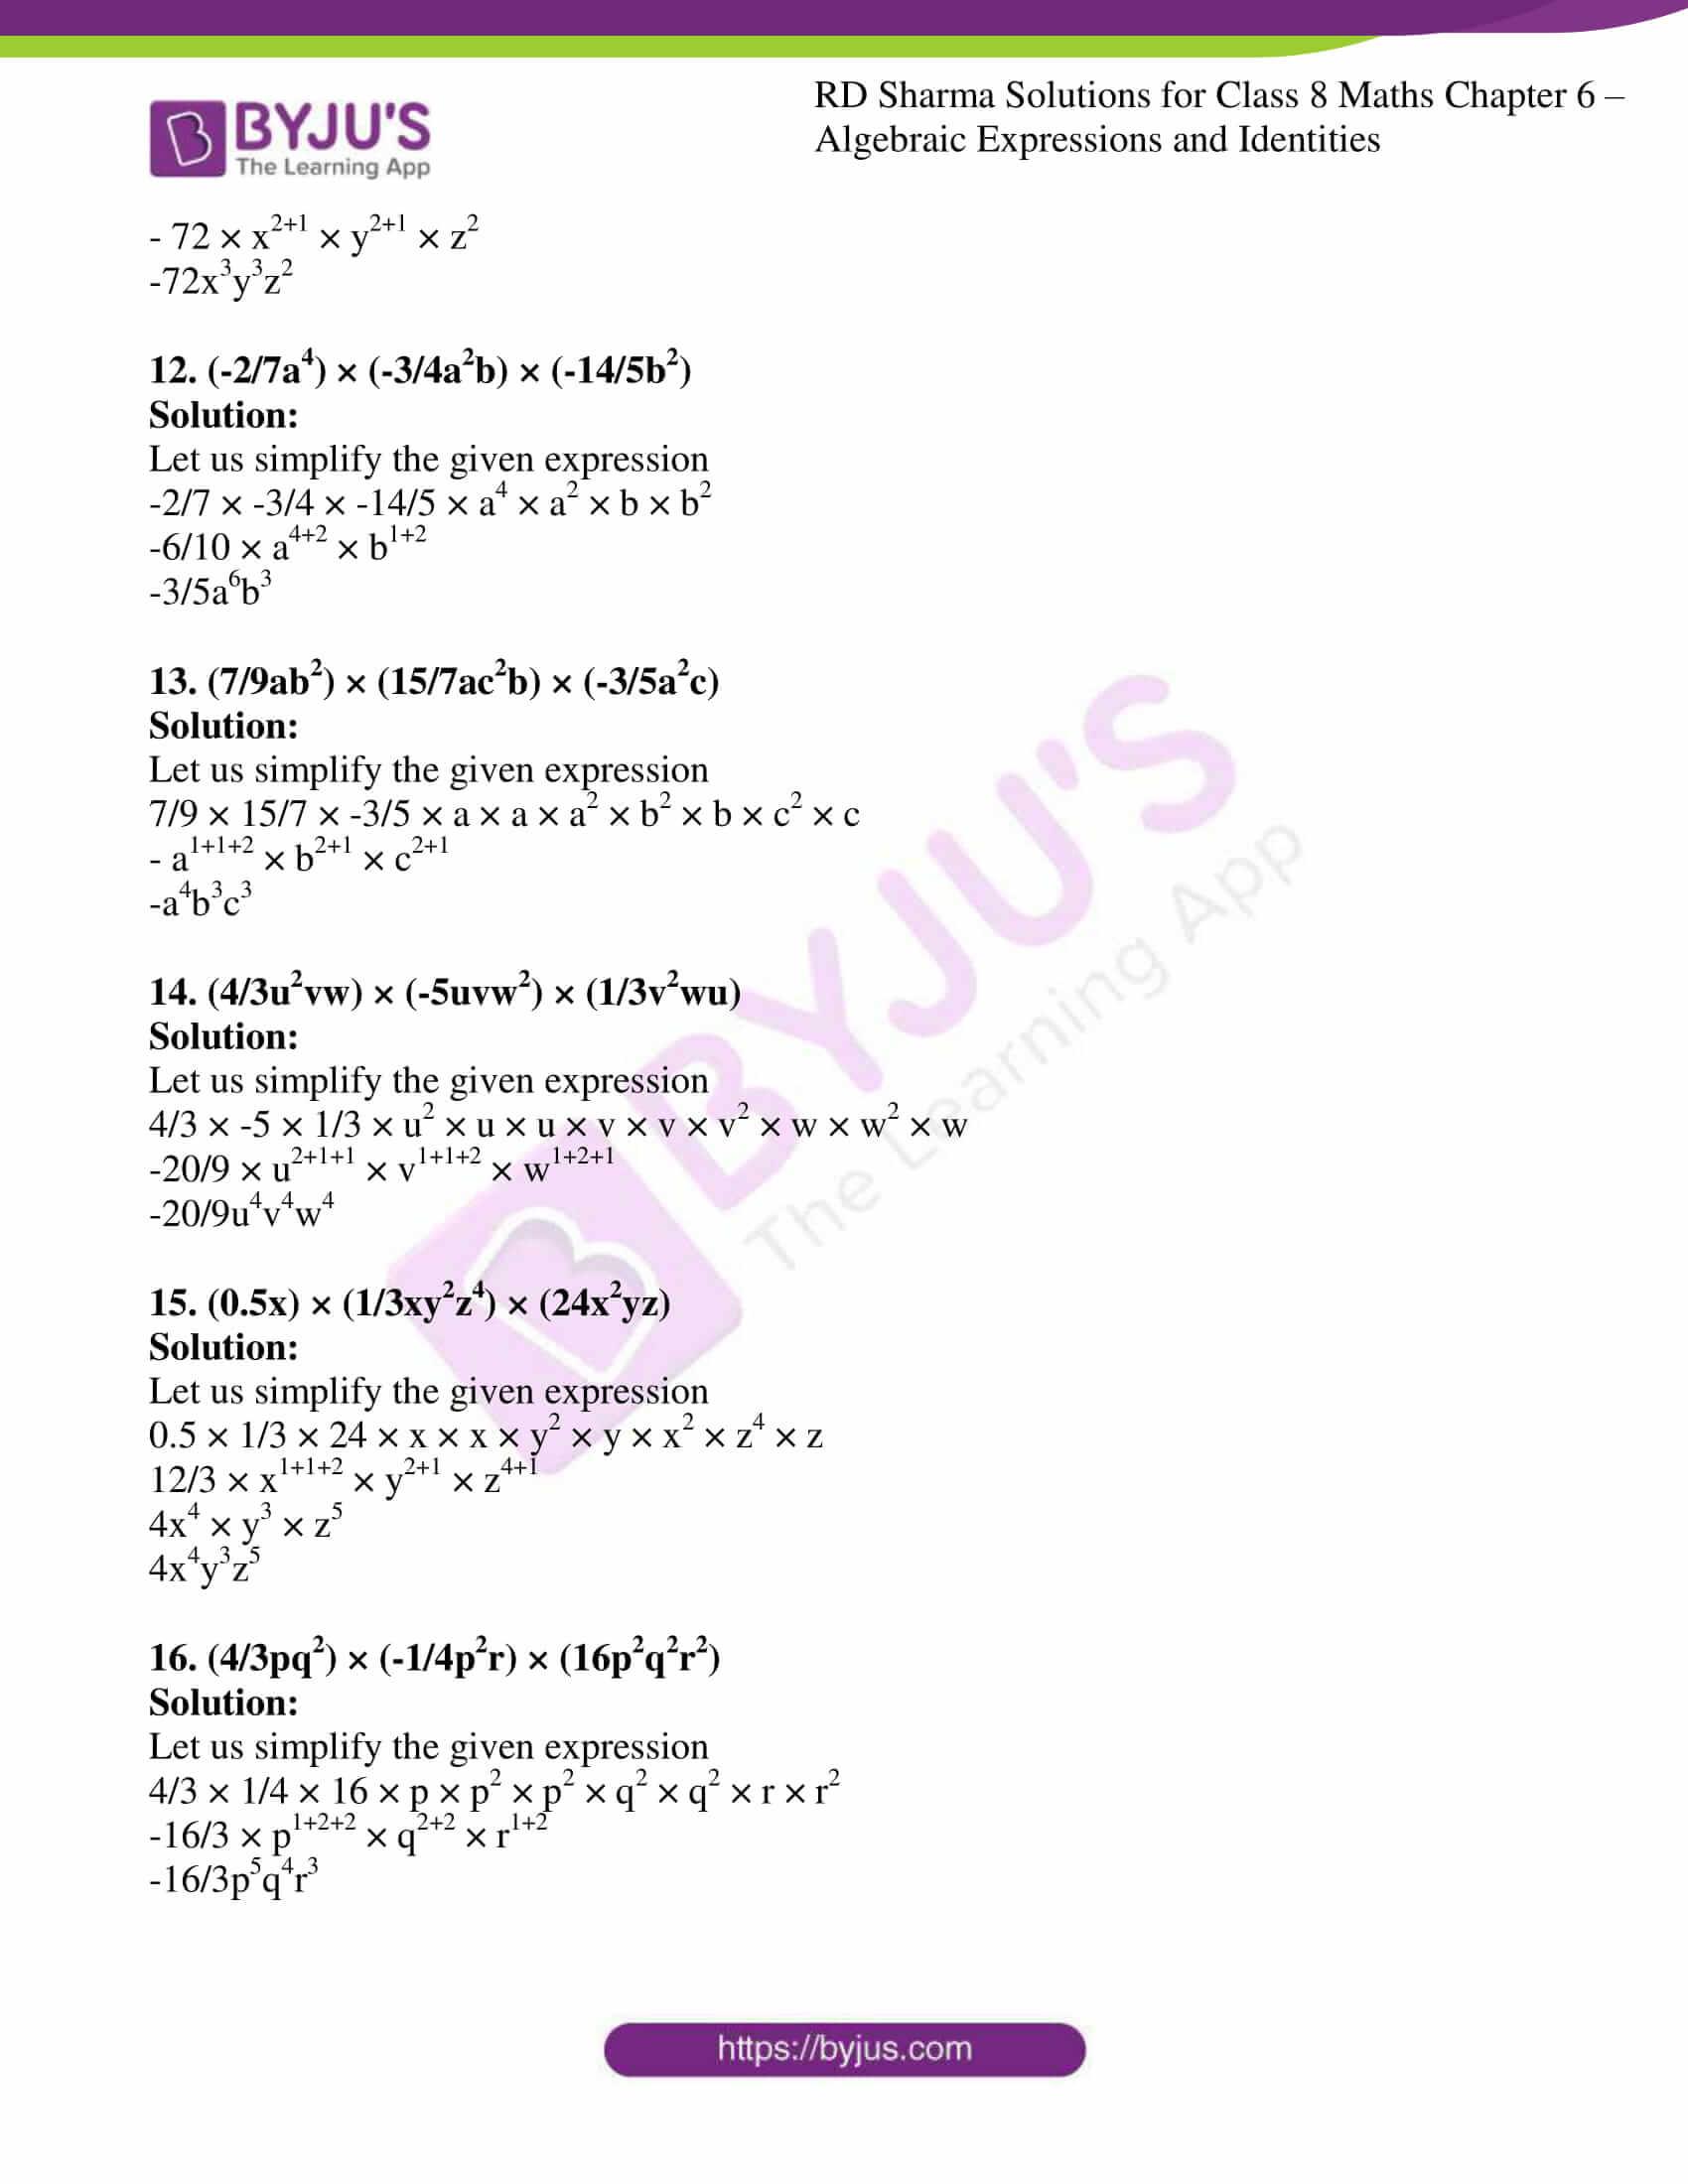 rd sharma class 8 maths chapter 6 exercise 3 3